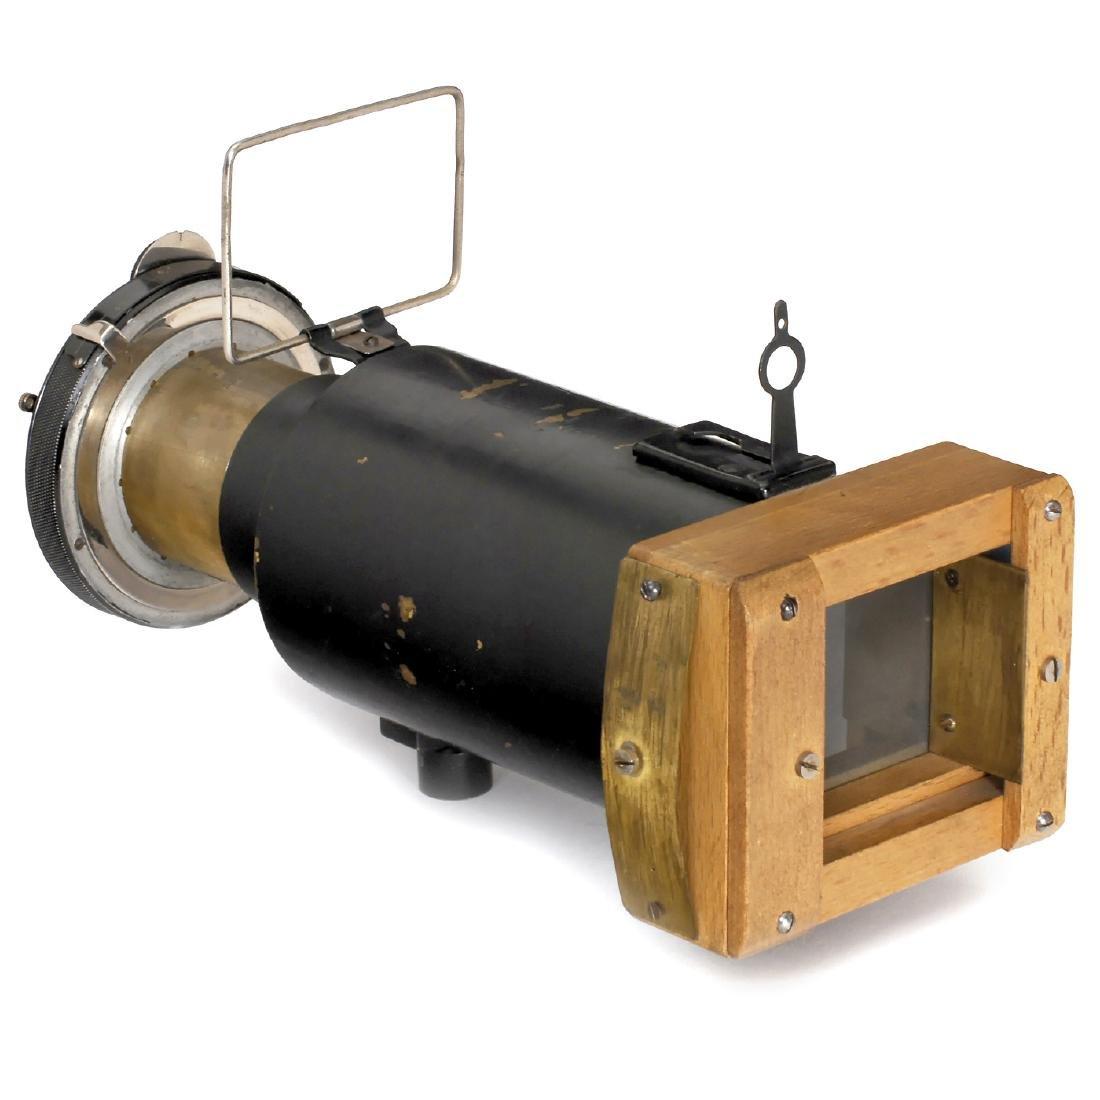 Telephoto Camera with Coronar 4,5/15 cm, c. 1925 - 2